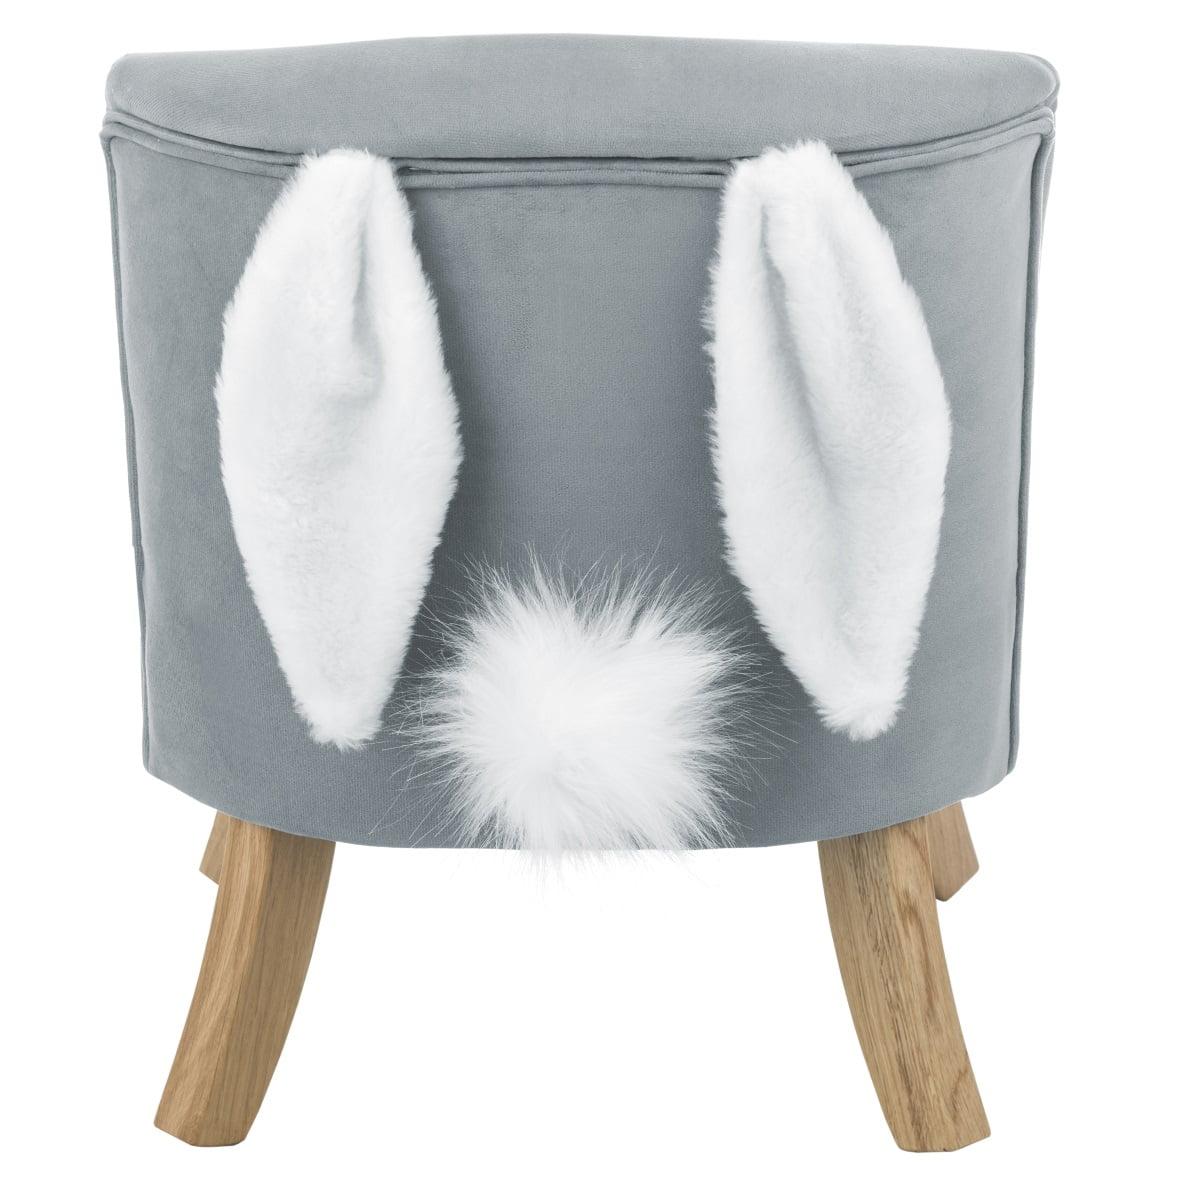 kreslo-zajac-2-dadaboom-sk